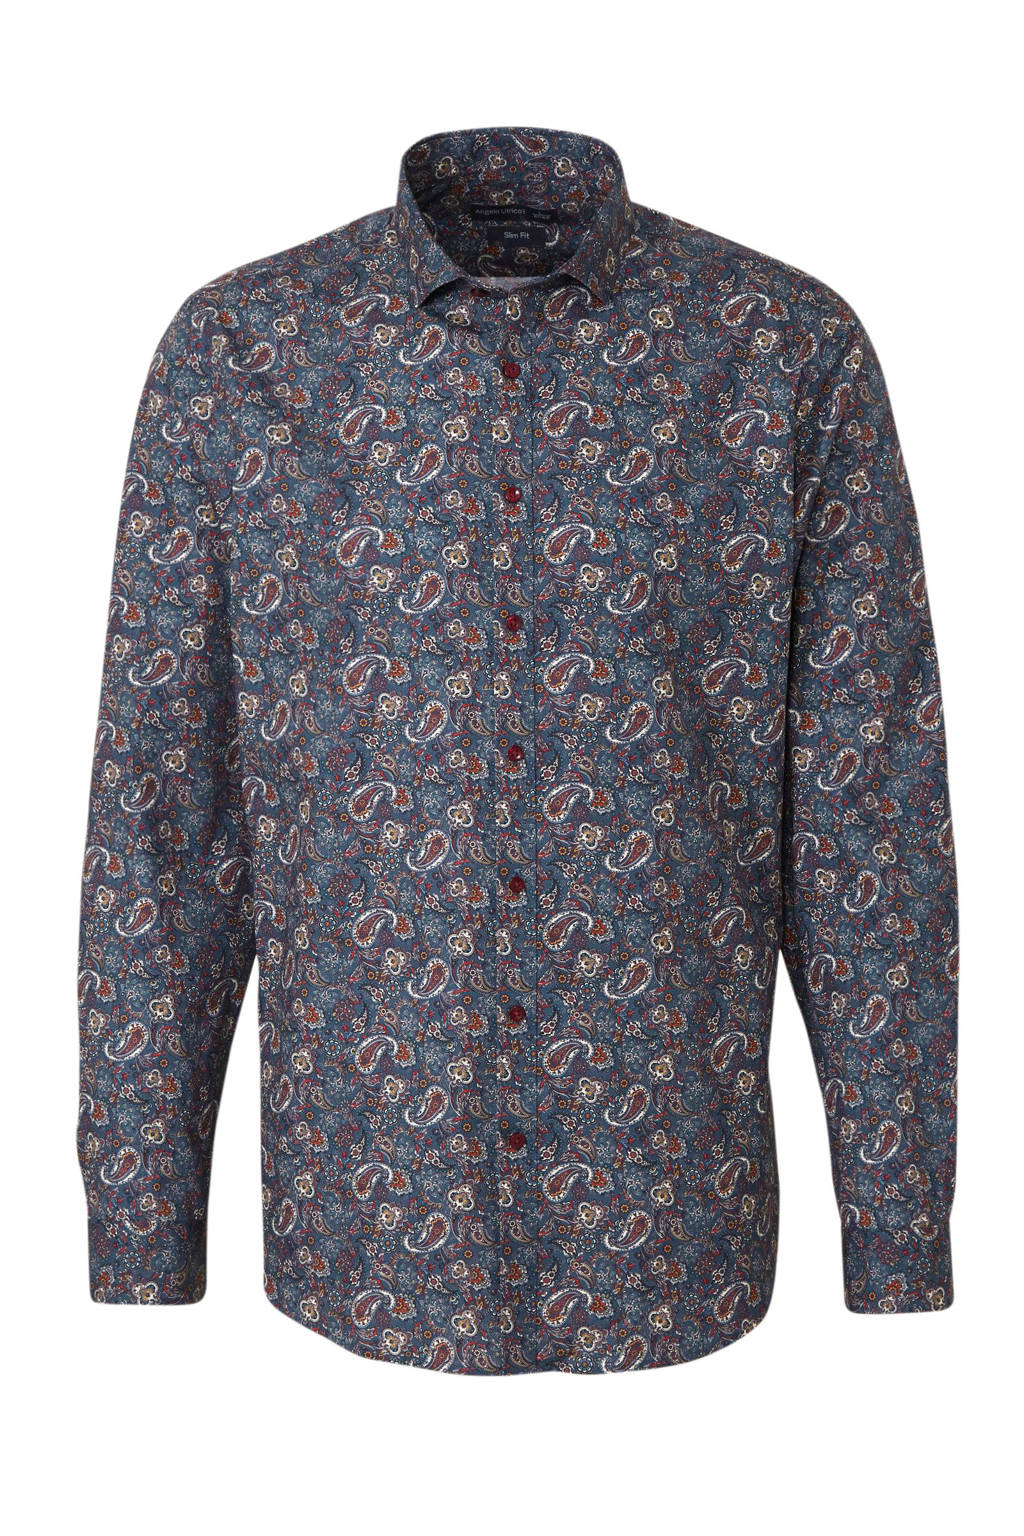 C&A Angelo Litrico slim fit overhemd met all over print blauw/multi, Blauw/multi